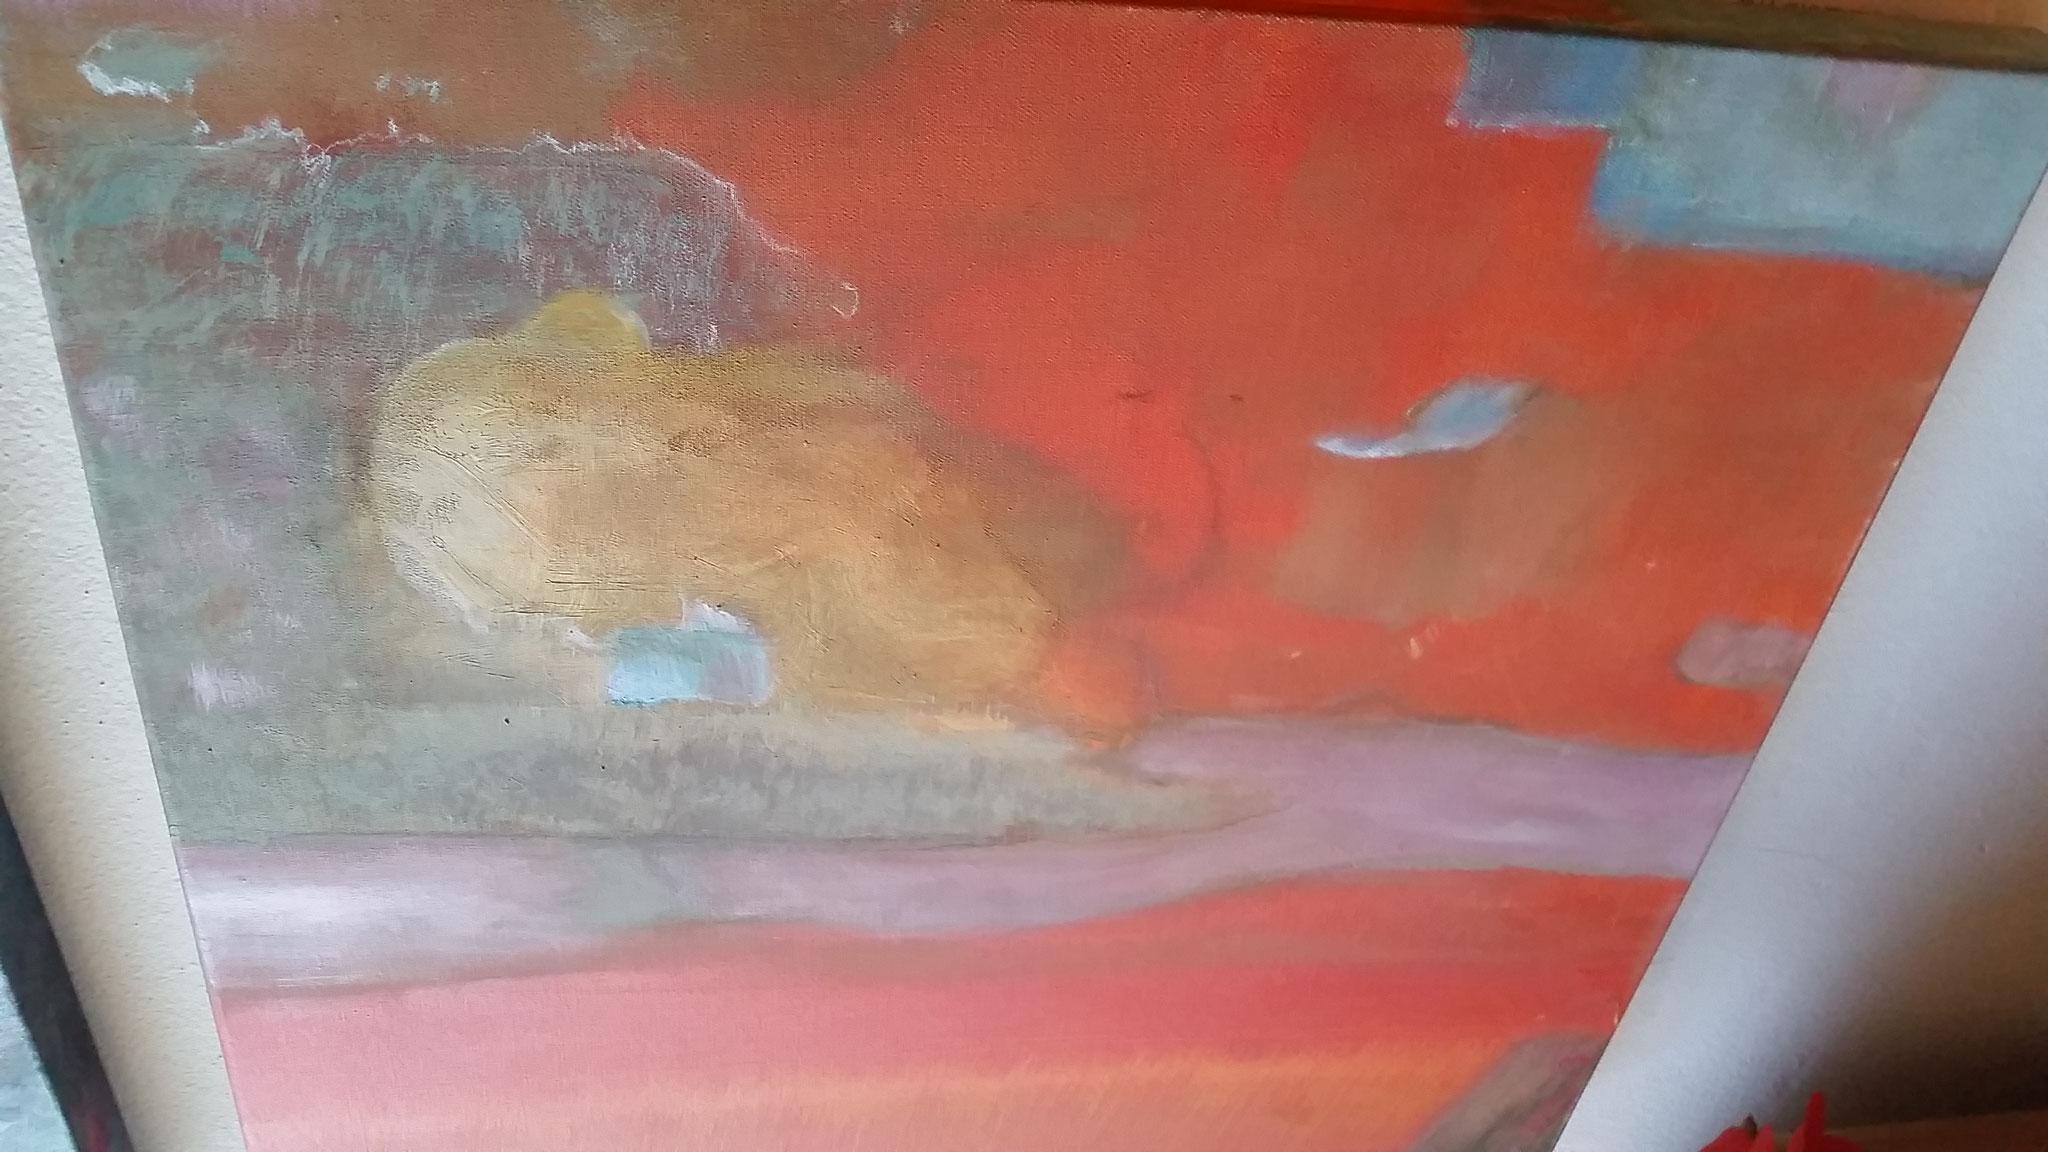 Treppen-Galerie 25, Maler Künstlerin Bozana